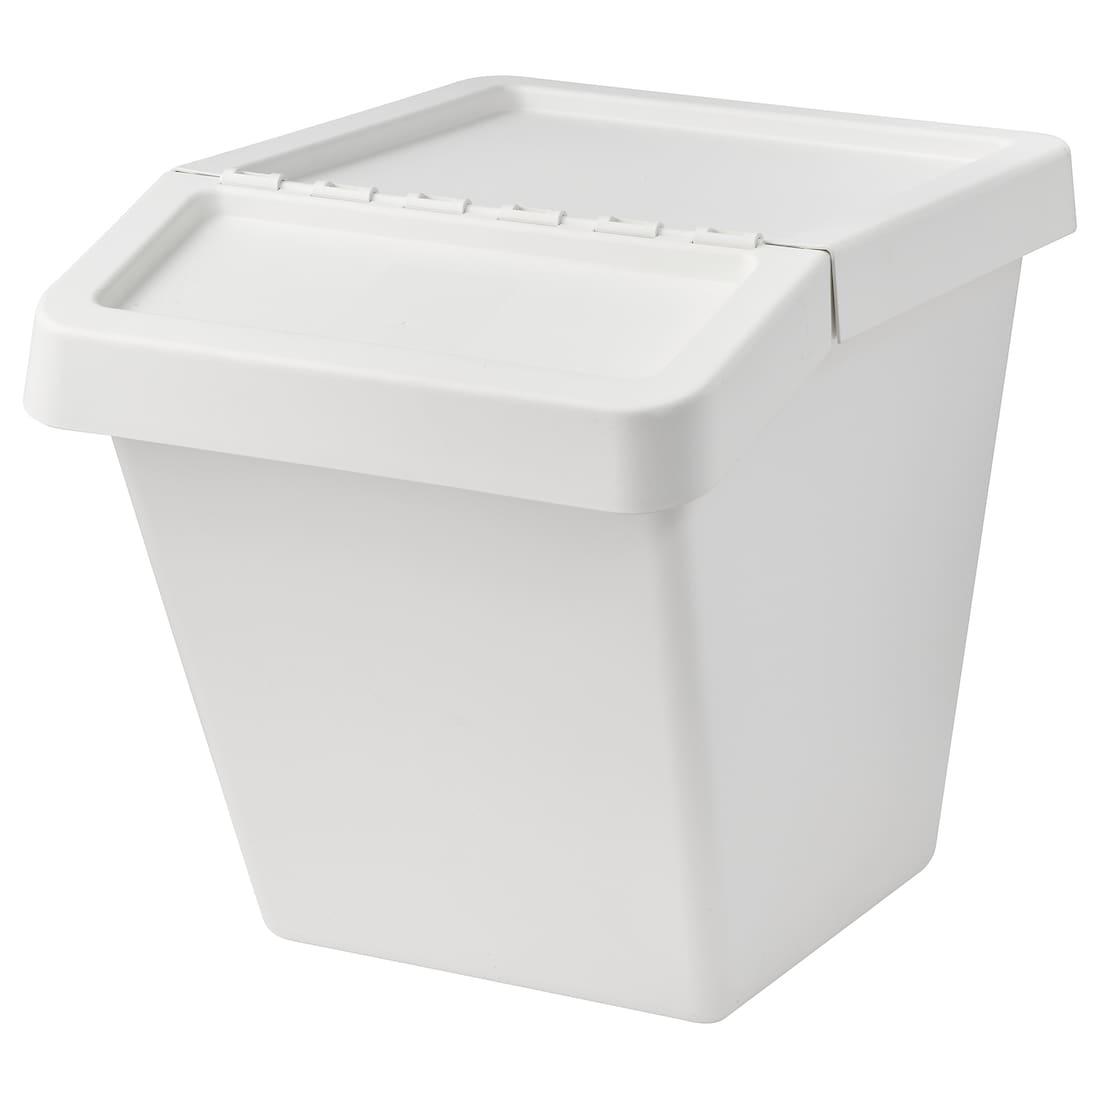 sortera-waste-sorting-bin-with-lid-white__0711187_PE728056_S5